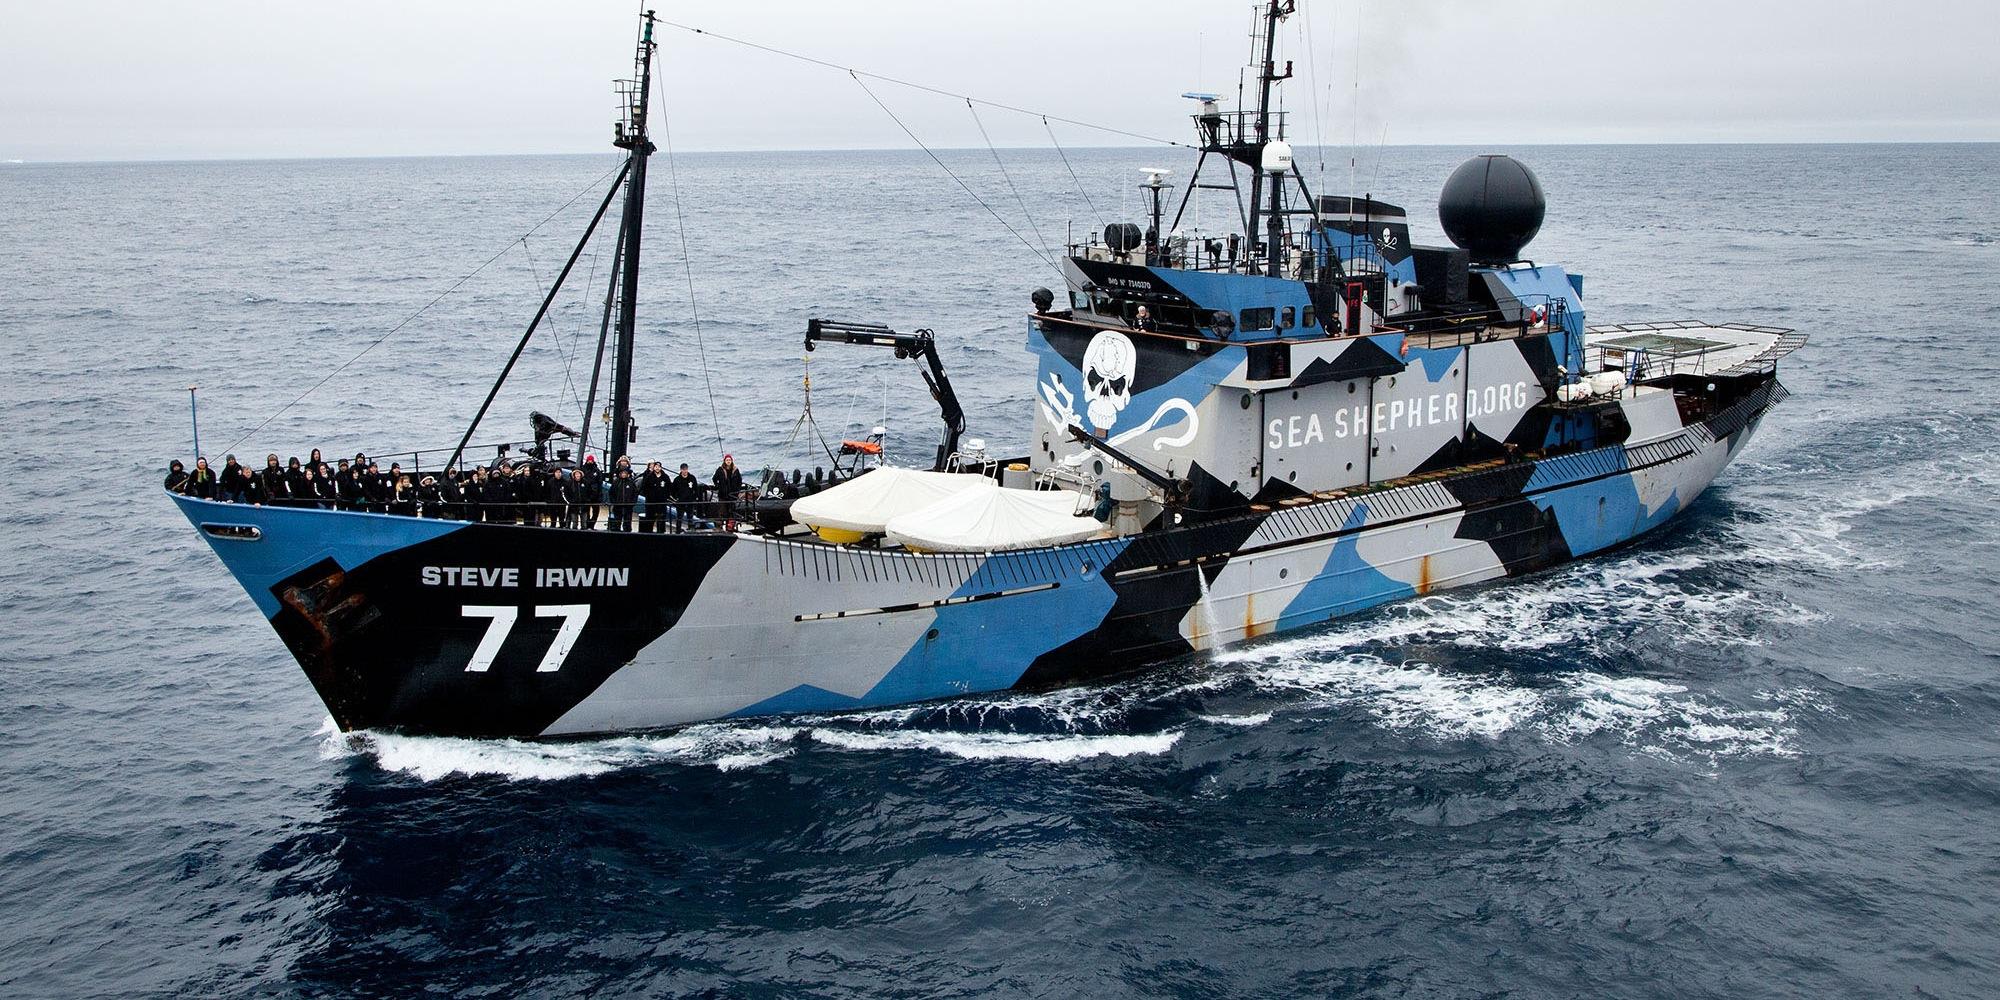 (Una delle navi di Sea Shepherd. Fonte immagine: www.seashepherdglobal.org)